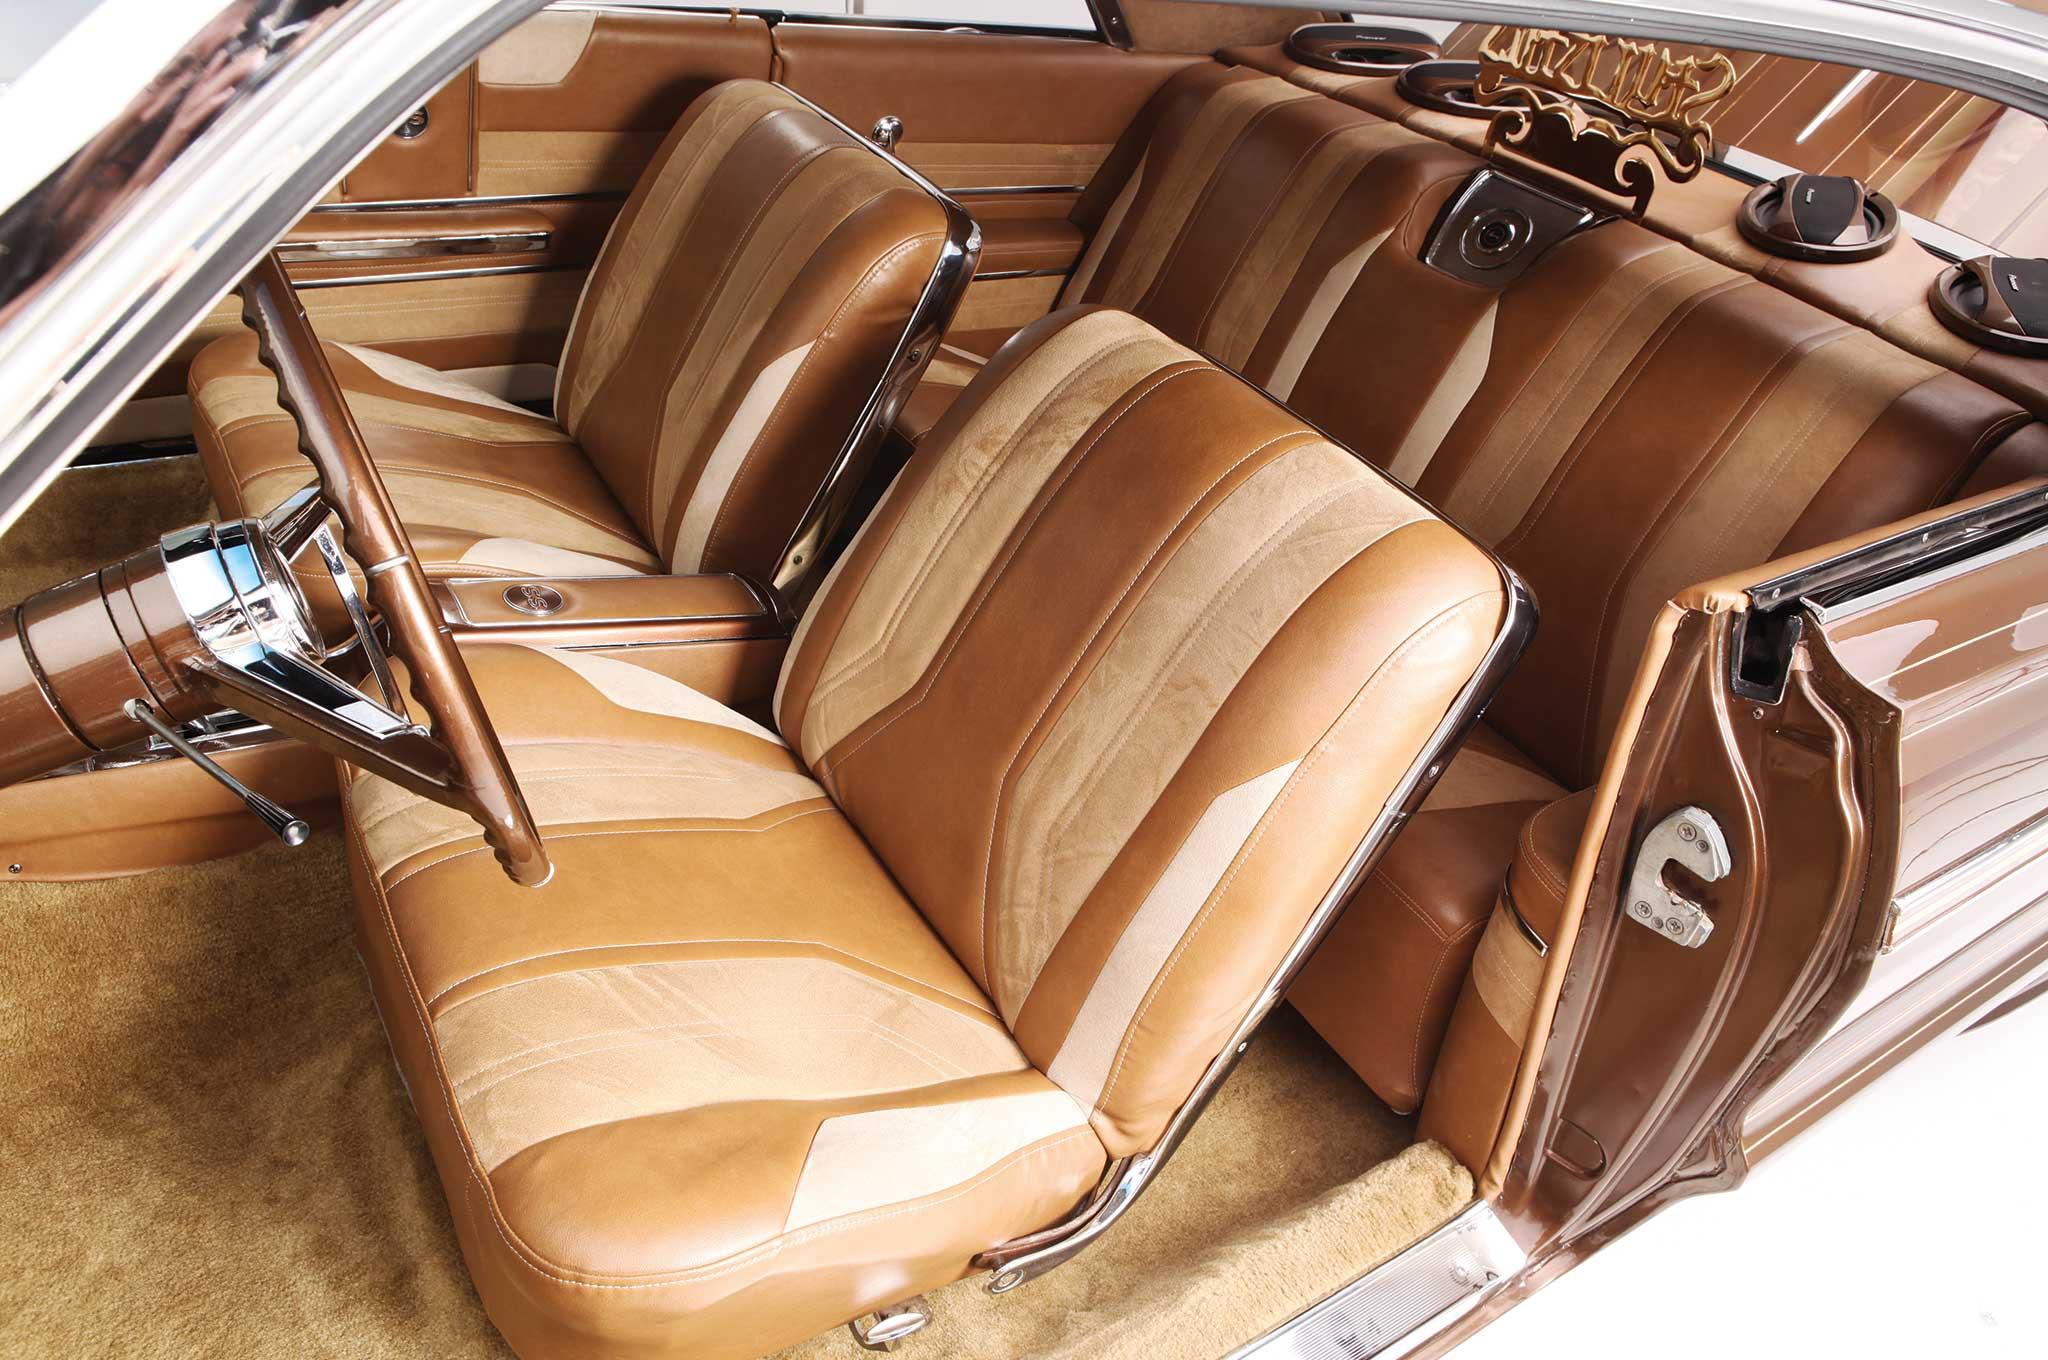 003 1964 chevrolet impala front seats